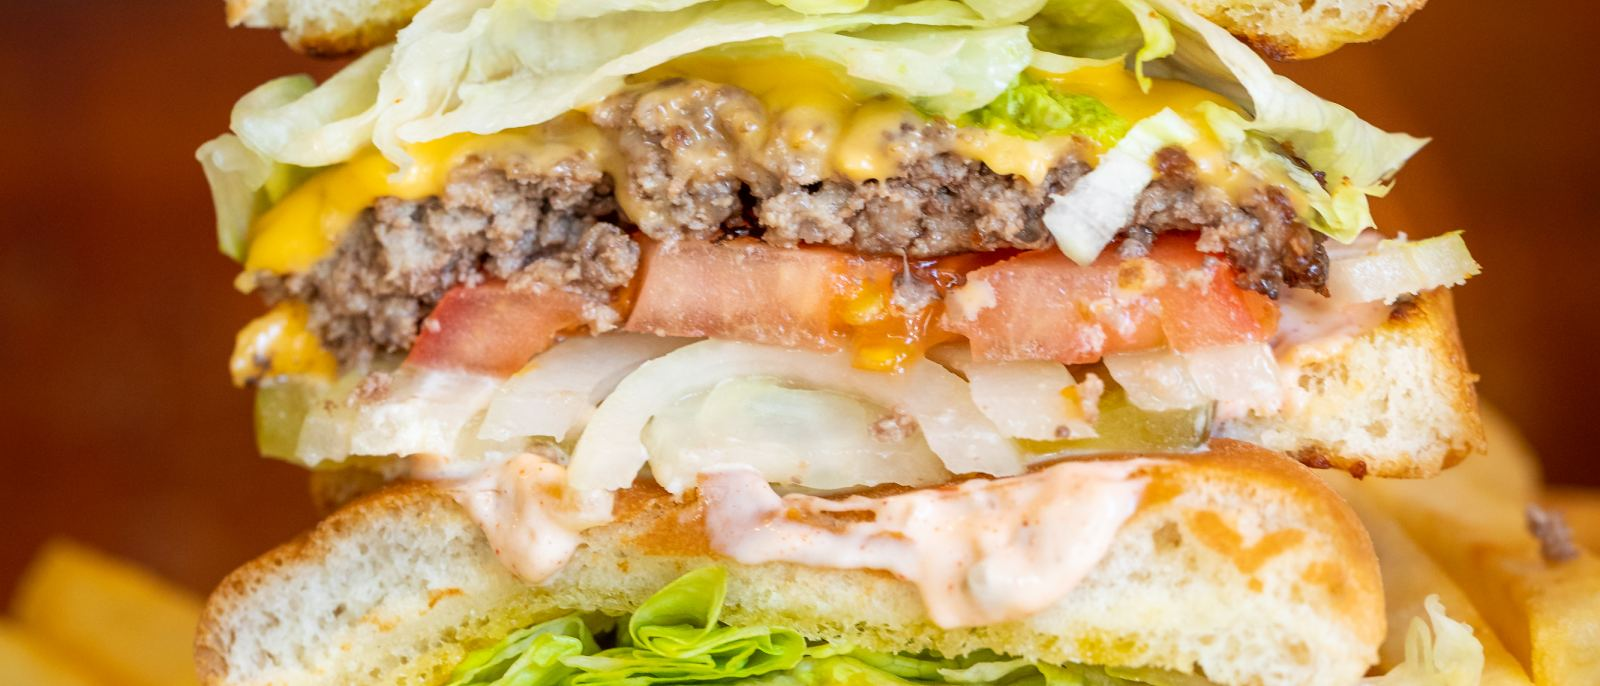 Cheeseburger at Pie 'n Burger in Pasadena